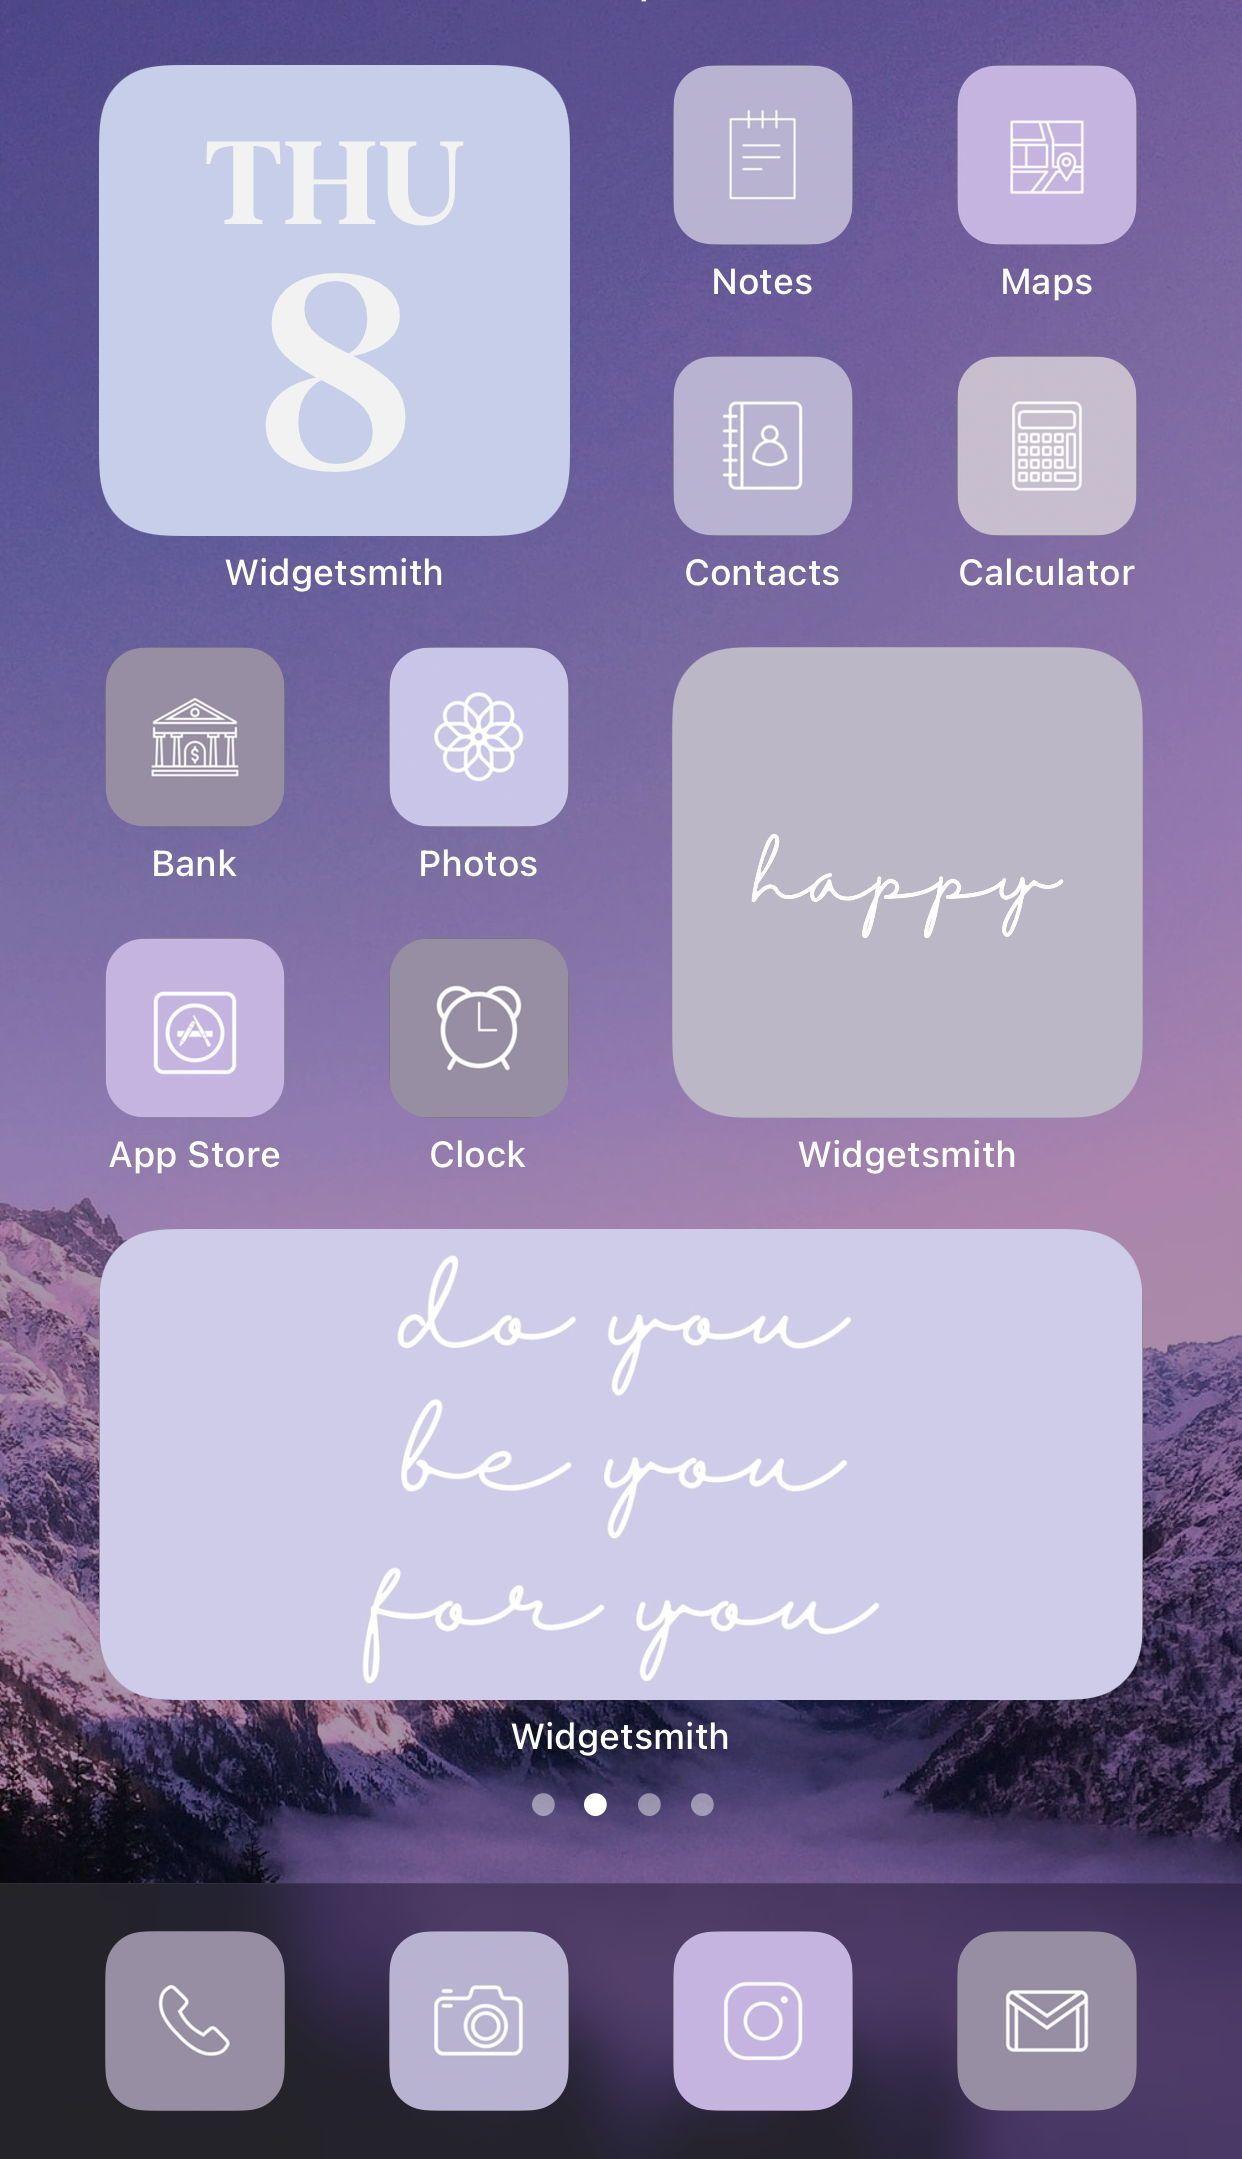 Purple Lavender Lilac Aesthetic 224 Iphone Ios 14 App Icons Ios14 Widget Photos Widgetsmith Shortcuts Widget Covers Ios 14 Icon Pack Iphone Wallpaper App Inspiration App Homescreen